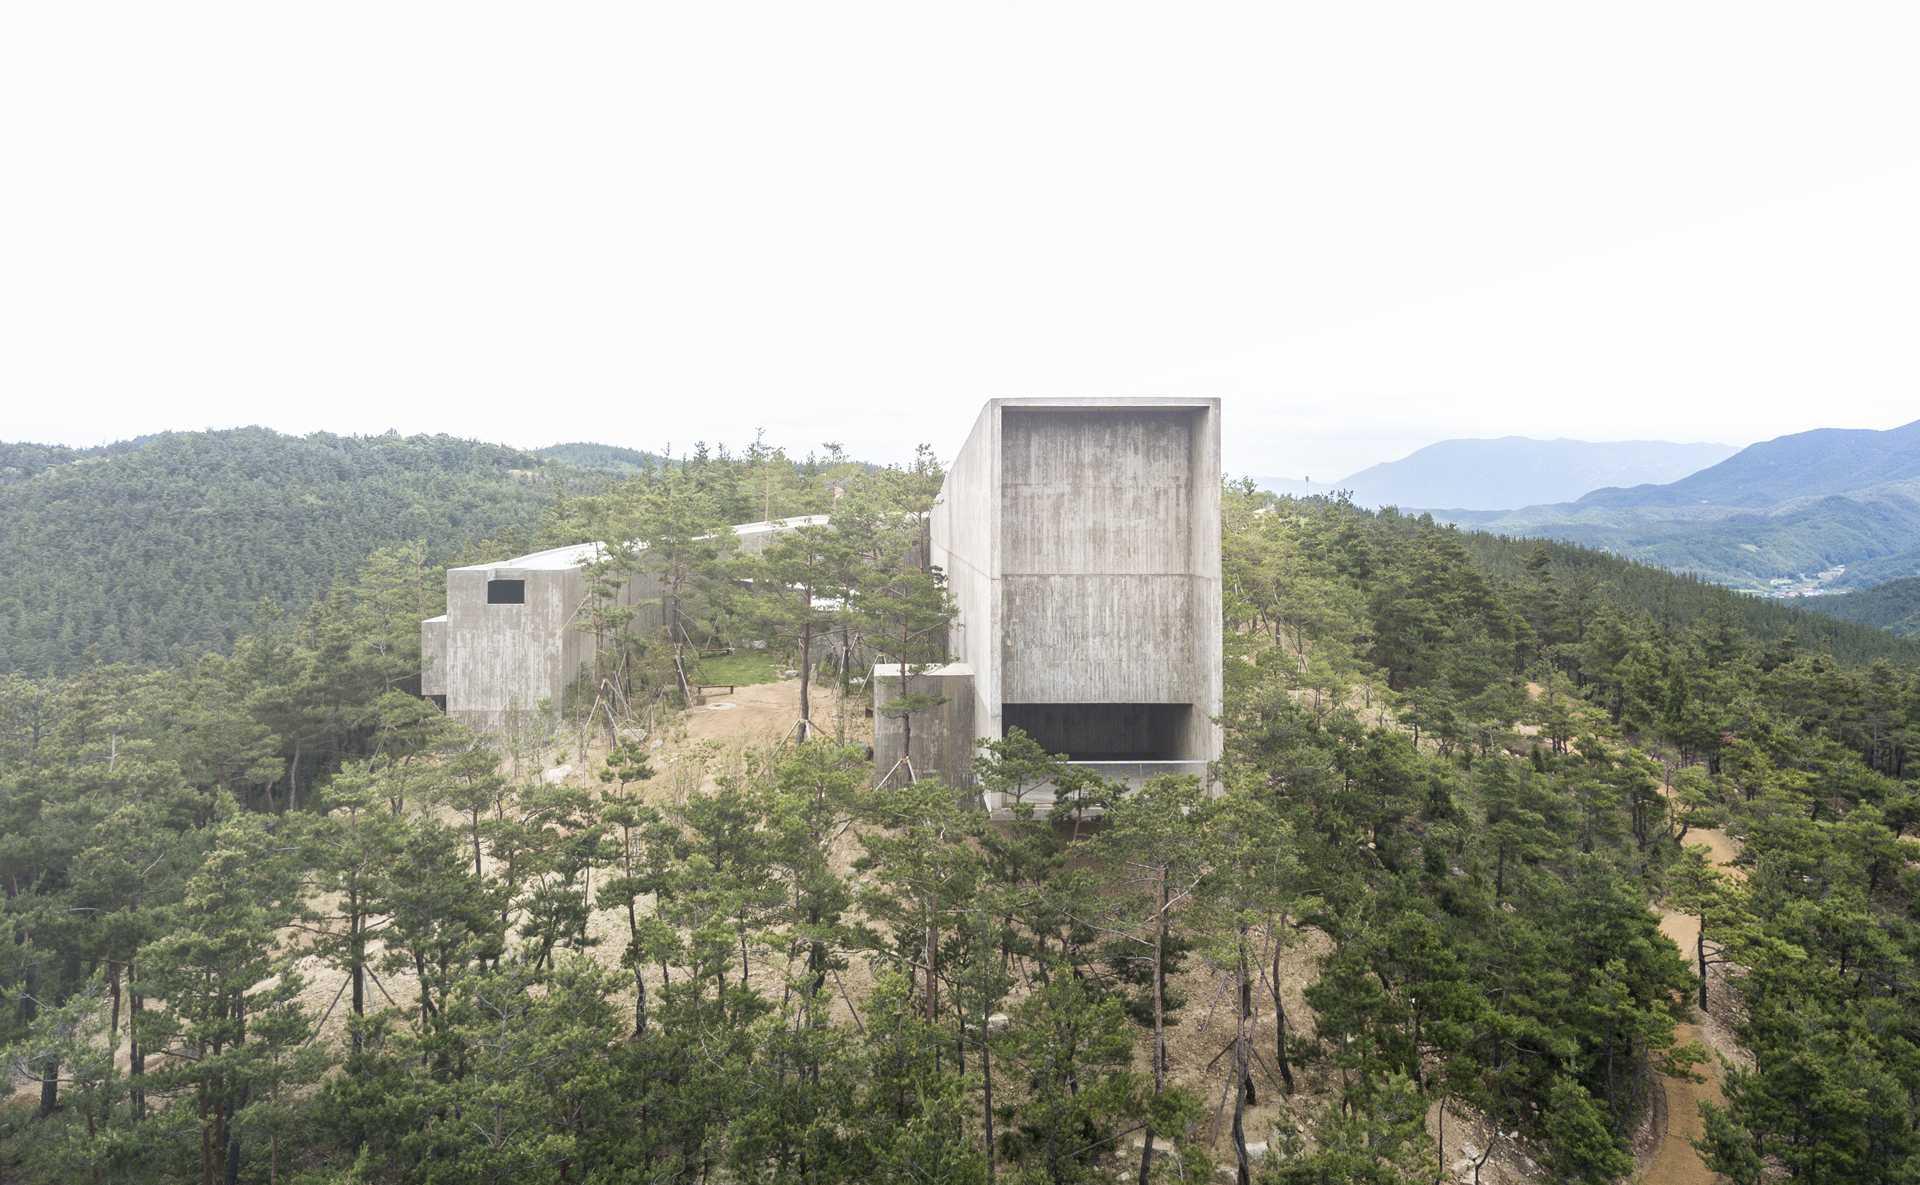 Art Pavilion in Saya Park  - 30 1 31